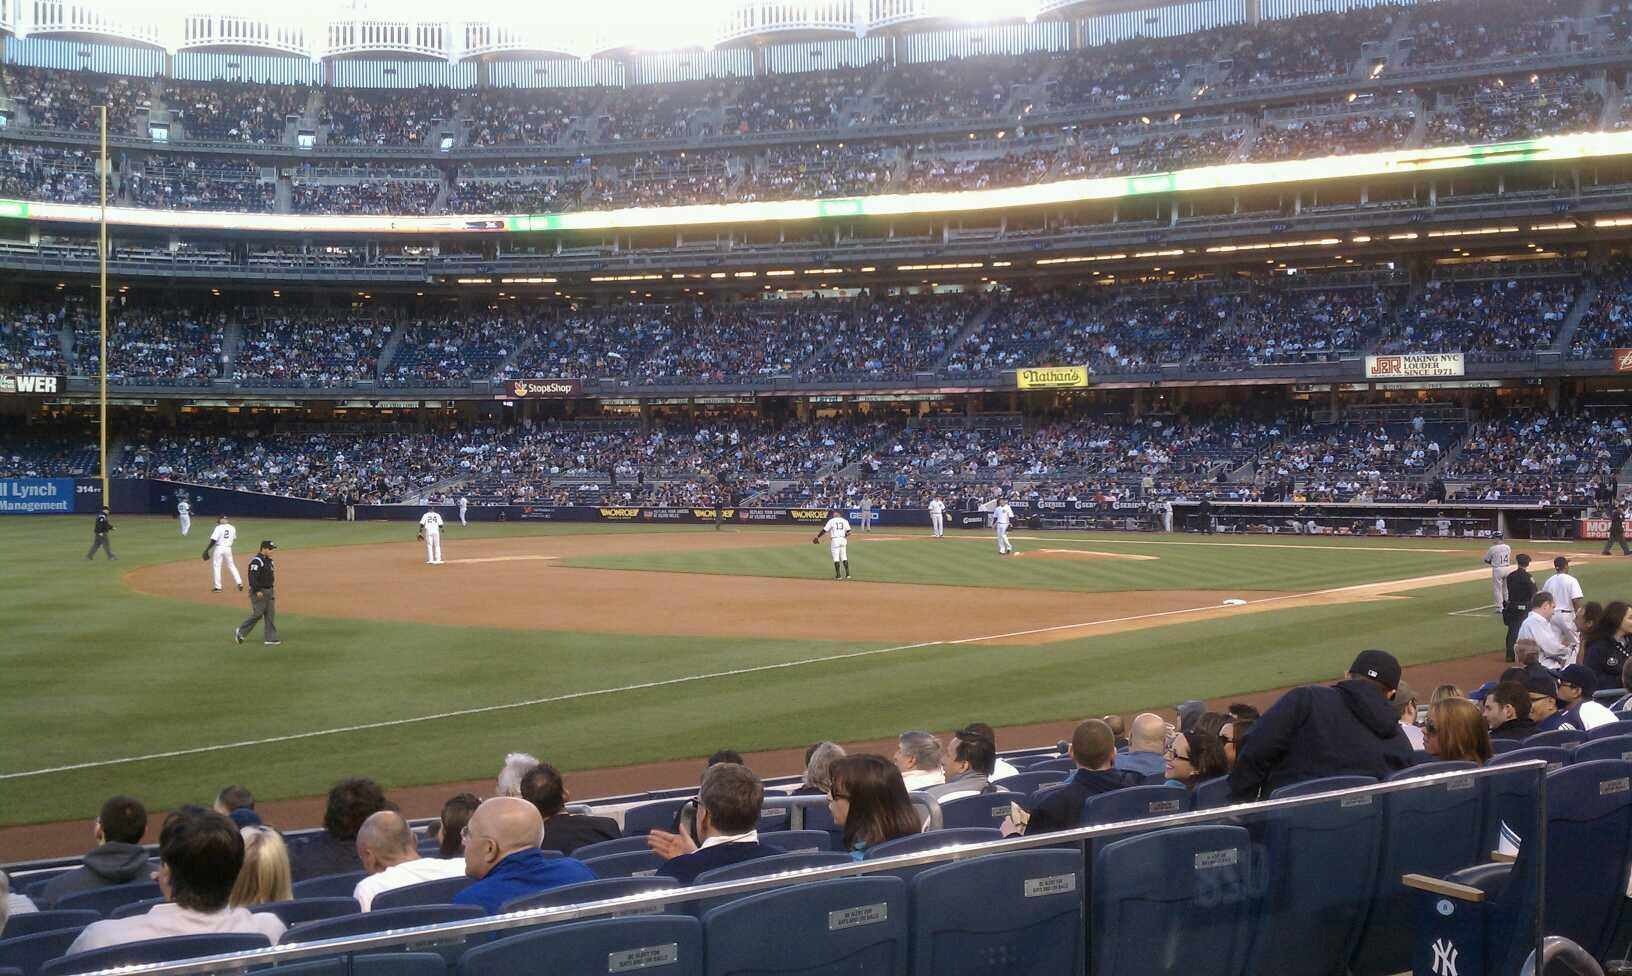 Yankee Stadium Secção 128 Fila 12 Lugar 8